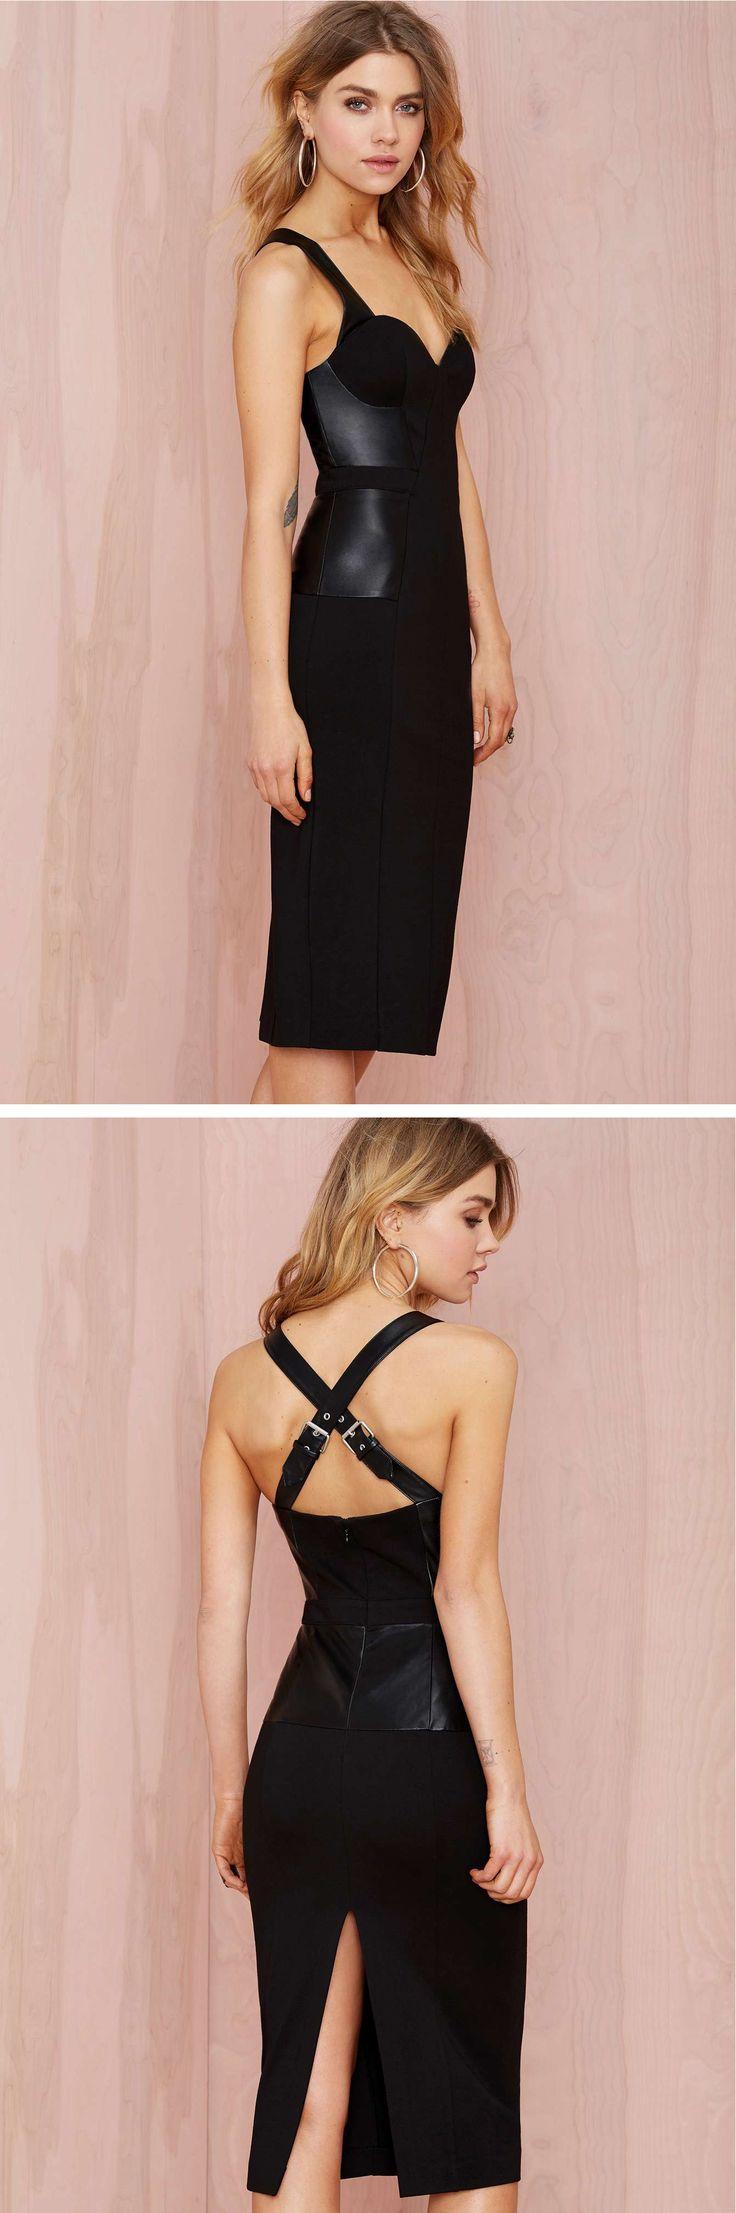 334 best vestidos para toda ocacione images on Pinterest | Long ...